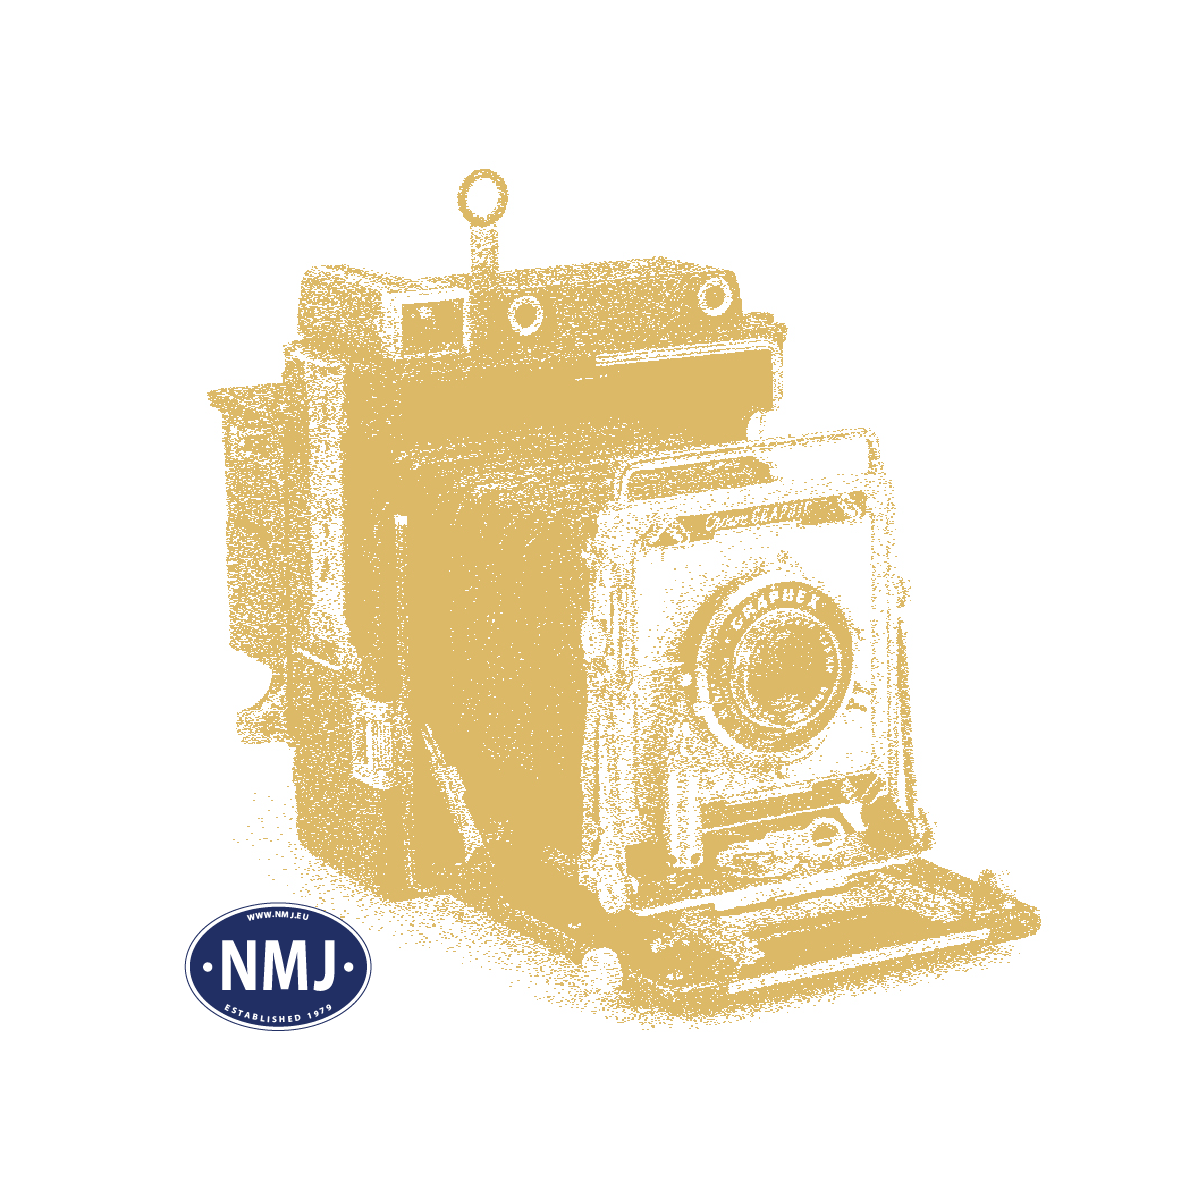 NMJT90011 - NMJ Topline NSB Di3a 617, Gammeldesign, DC